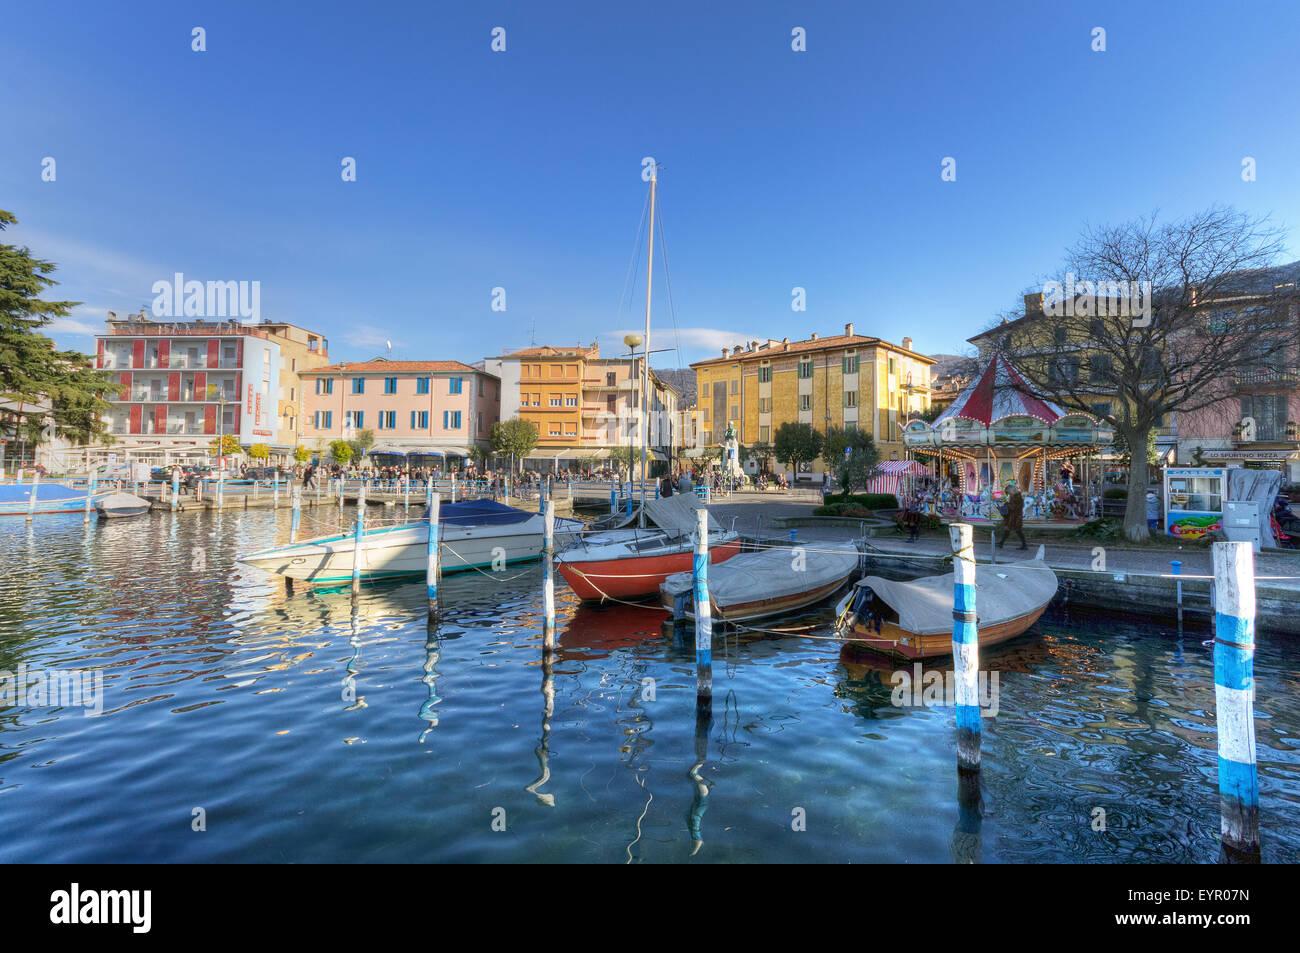 Italy, Lombardy, Iseo lake - Stock Image